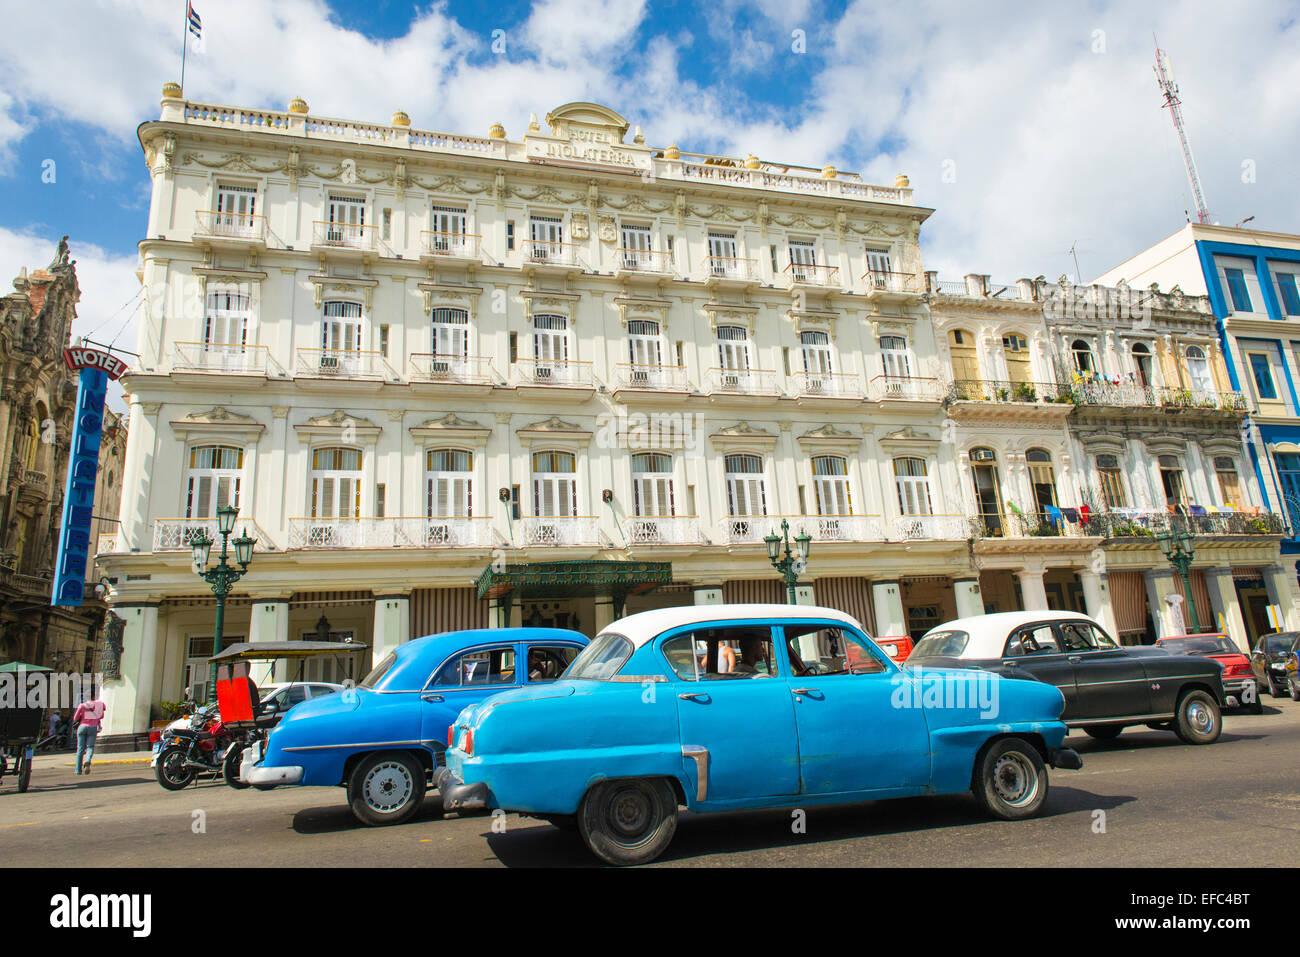 Cuba Old Havana La Habana Vieja Central Park Paseo de Marti ( Prado ) Hotel Inglaterra street scene classic American - Stock Image